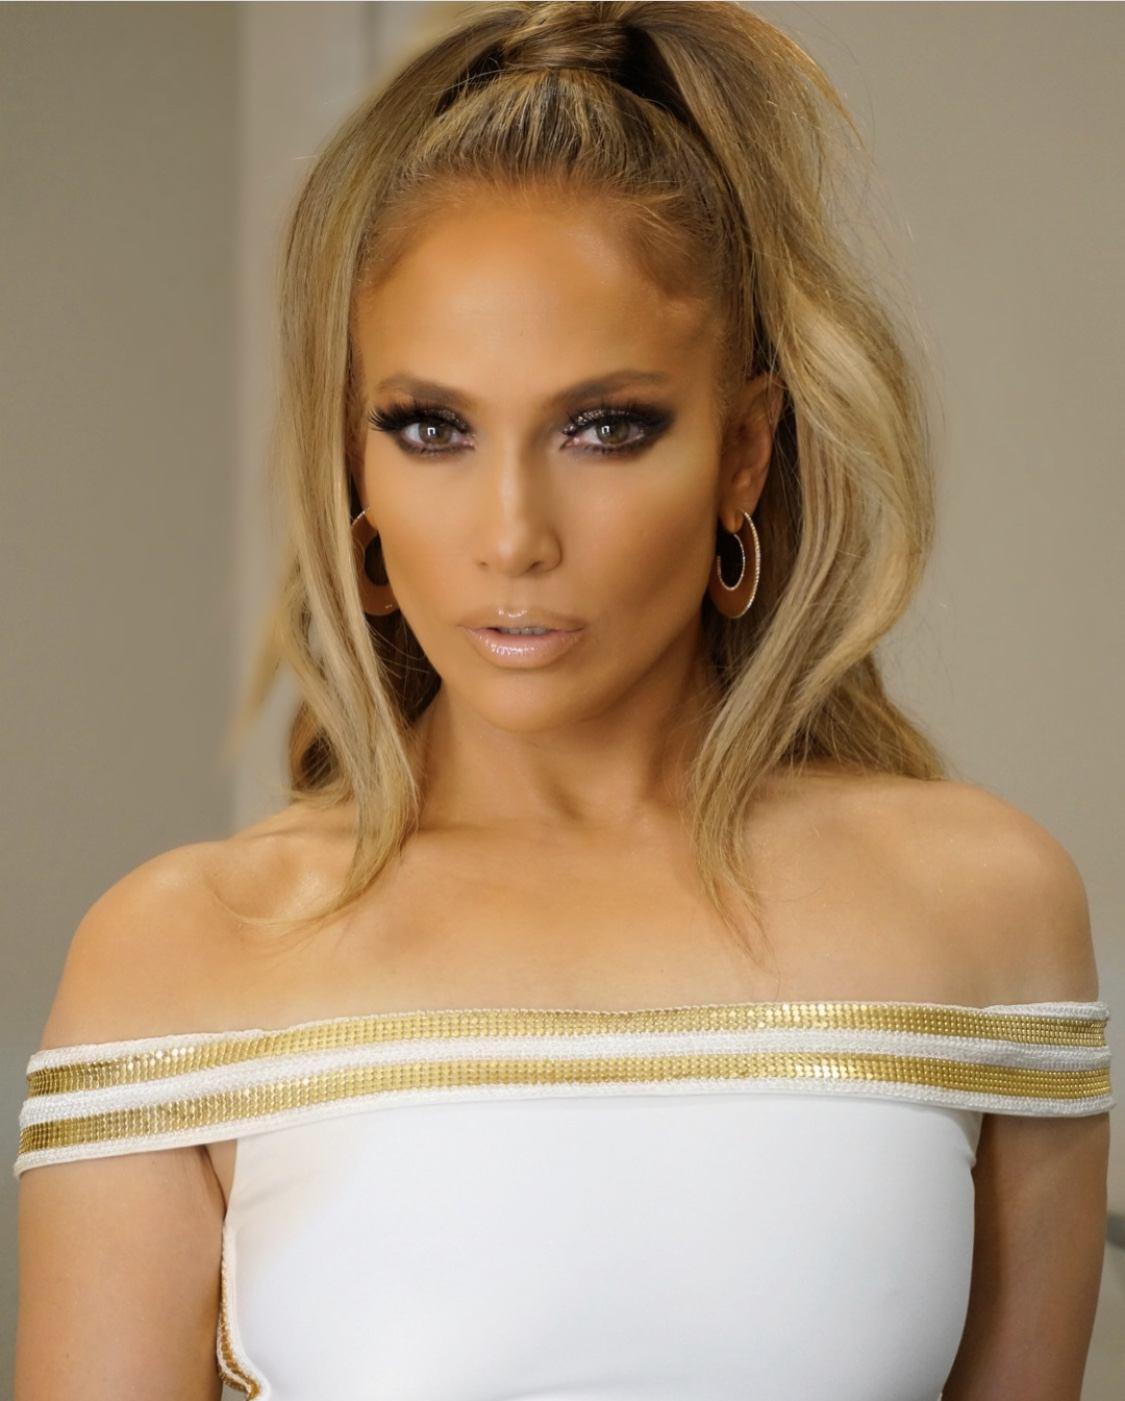 Jennifer Lopez Is Taking Home The Michael Jackson Video Vanguard Award At The 2018 VMAs